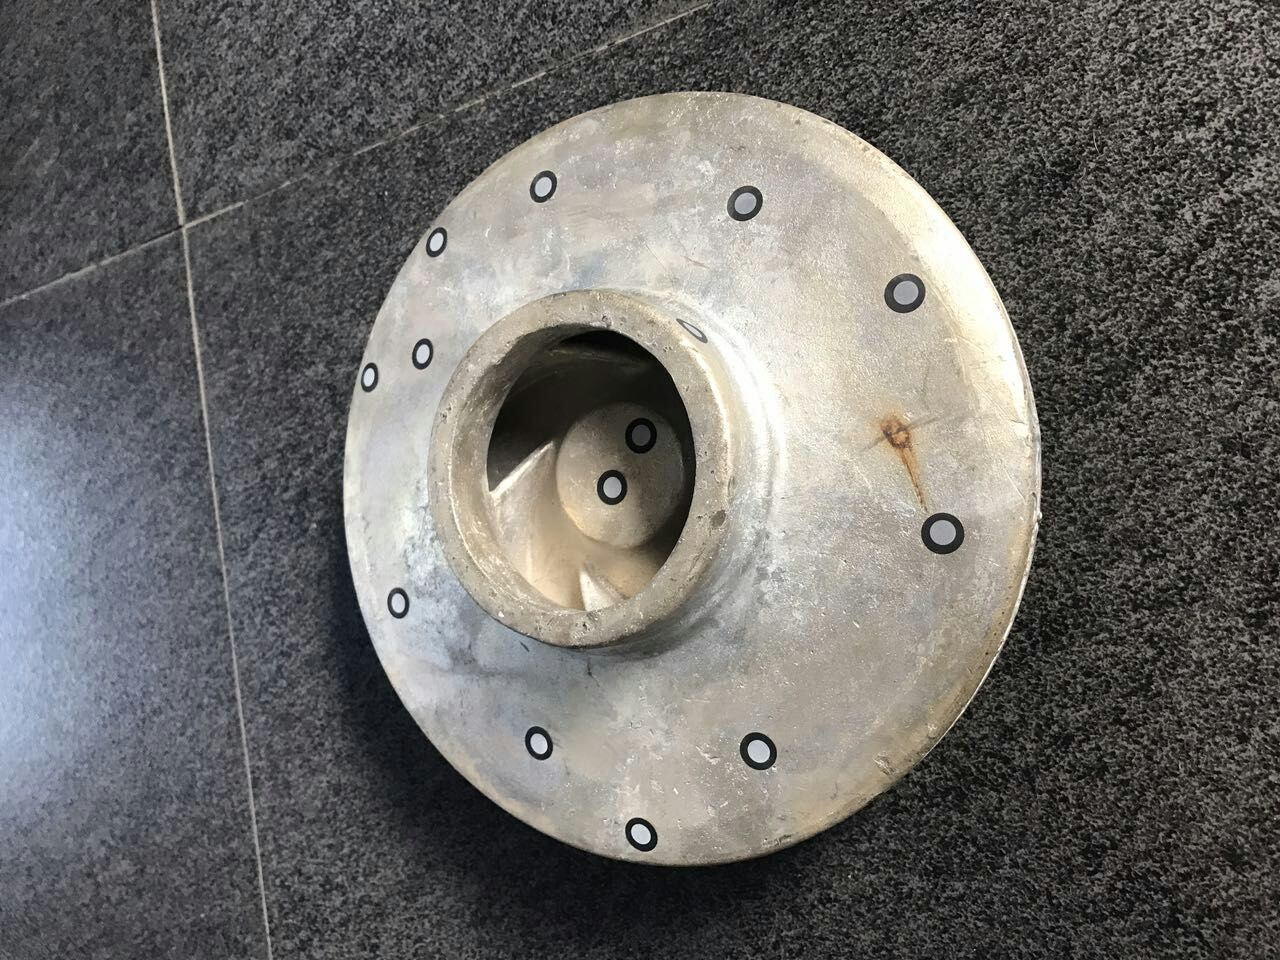 Accelerate Reverse Engineering of Pump Impeller Design 2